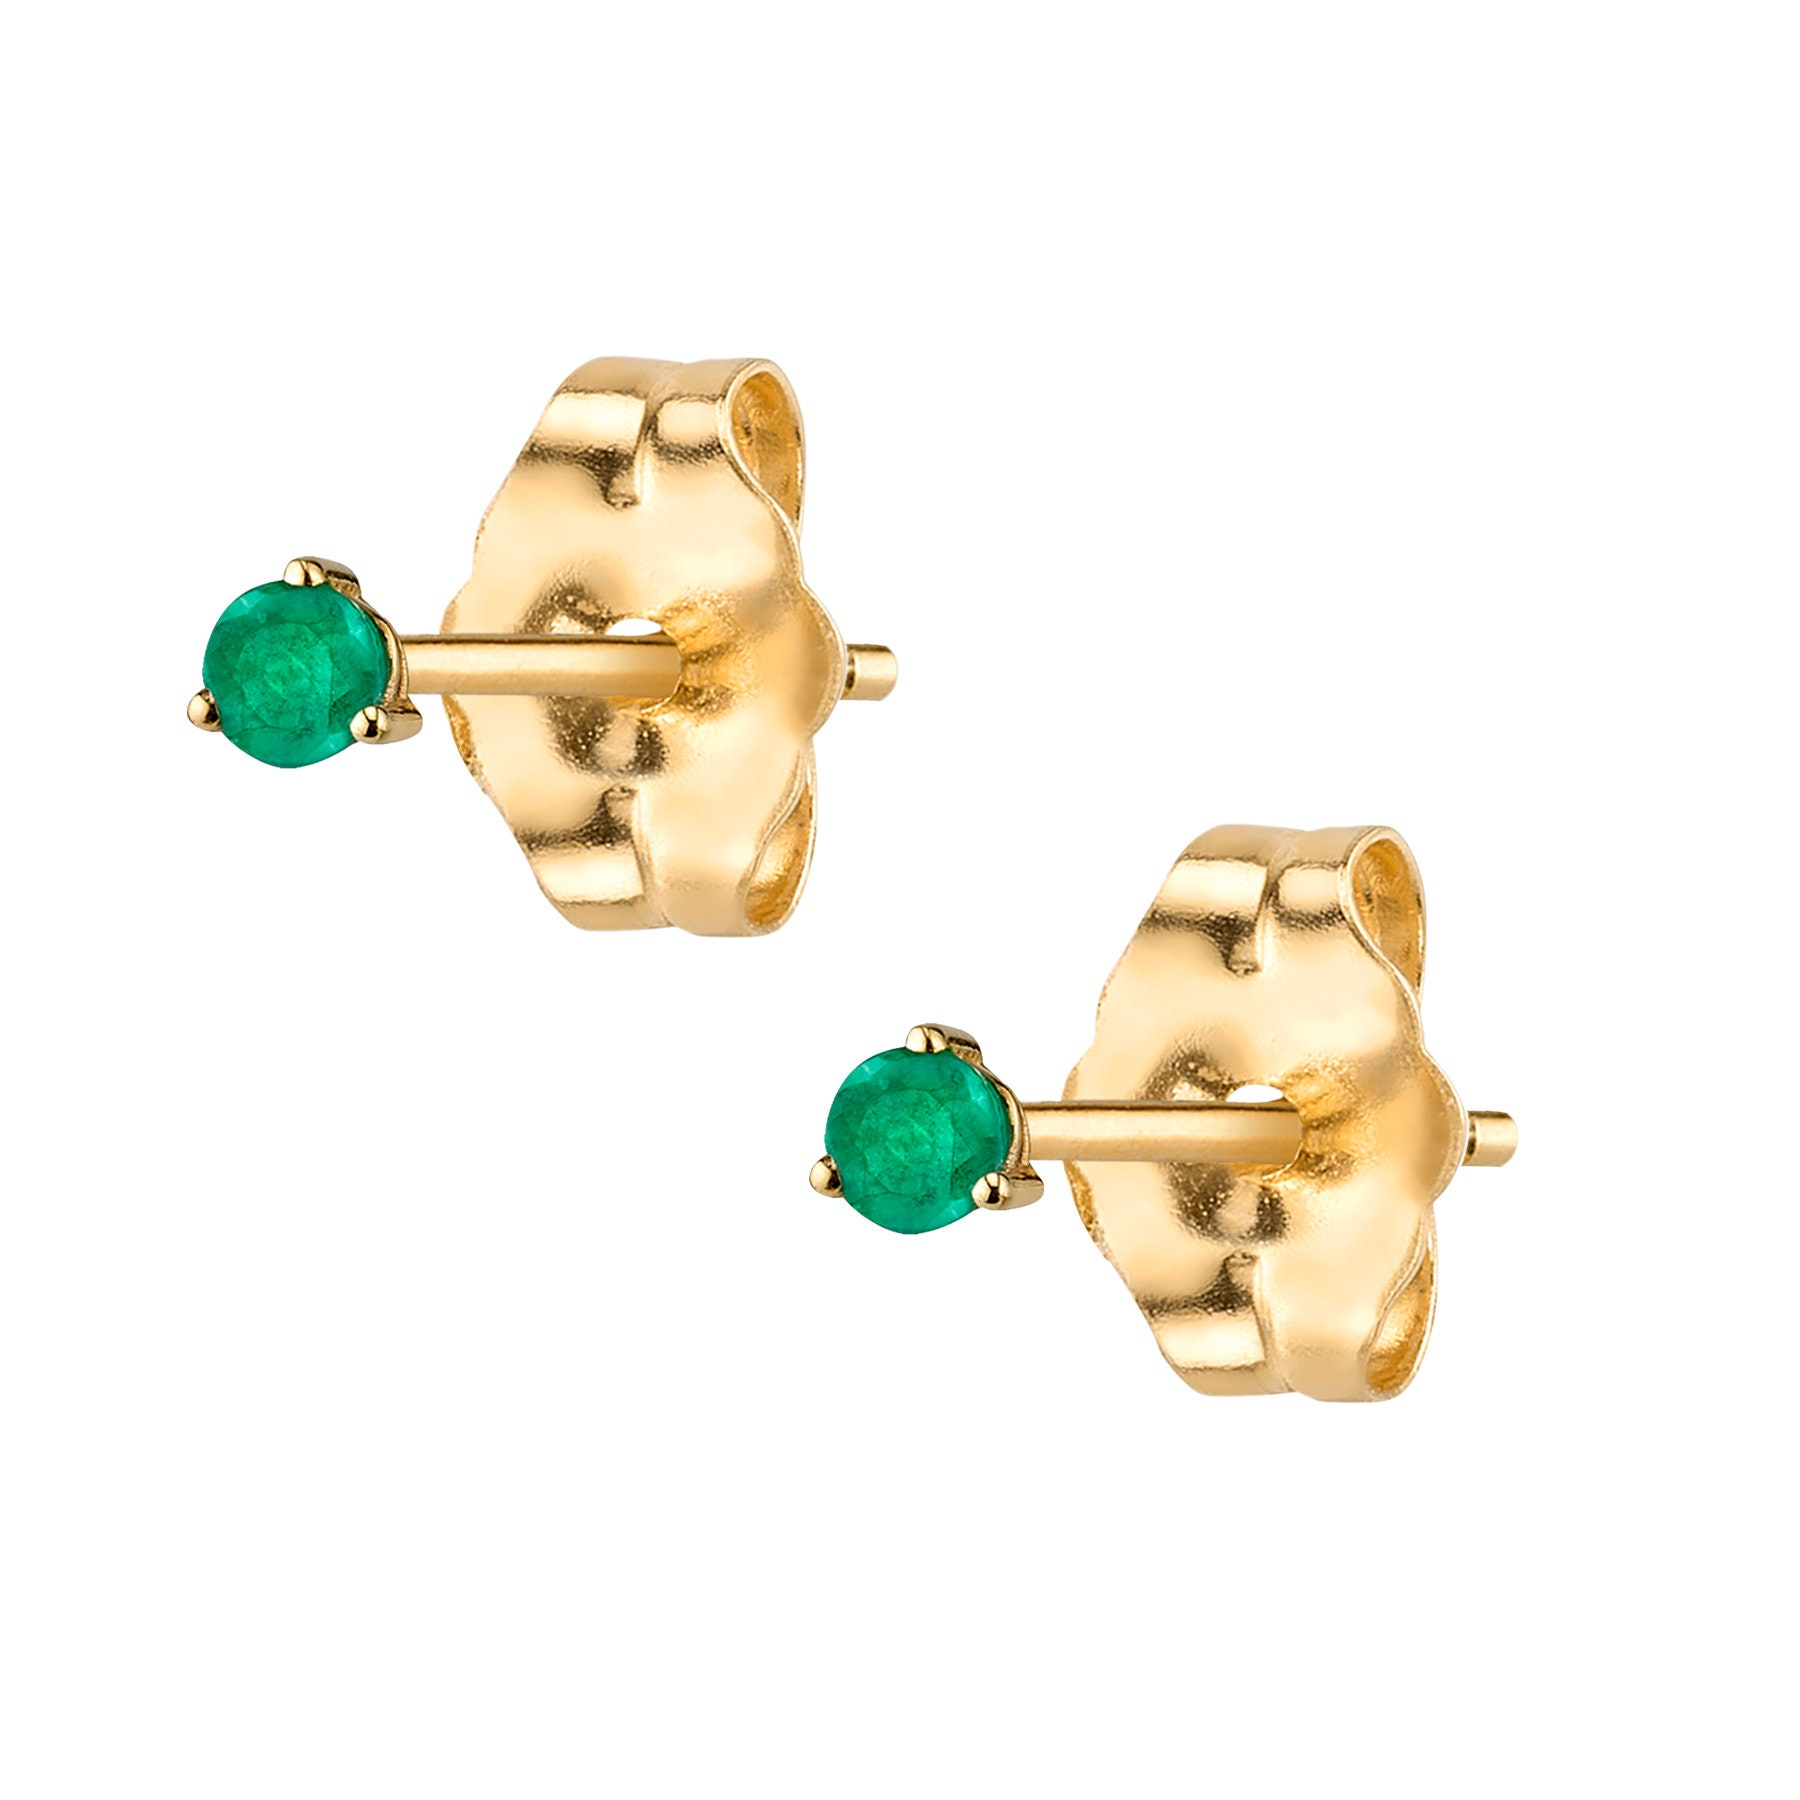 25a4c34a4 14K Gold Emerald Stud Earrings Emerald Studs Gold Emerald   Etsy